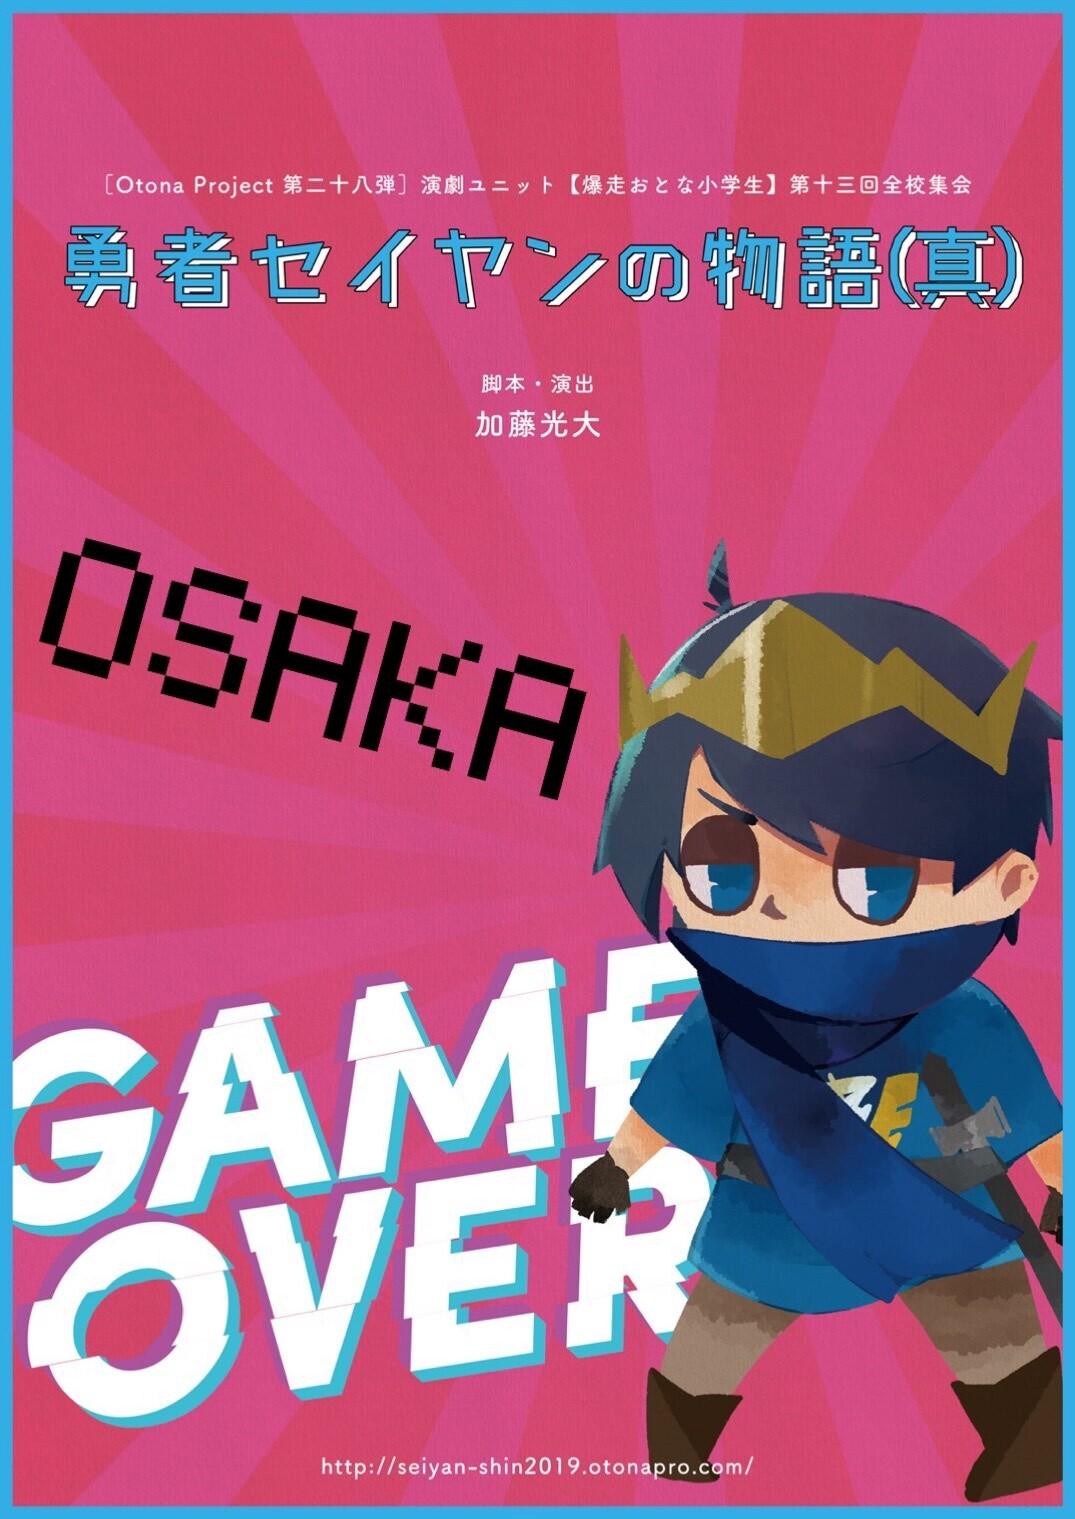 【DVD】大阪公演『勇者セイヤンの物語(真)』2019年Ver